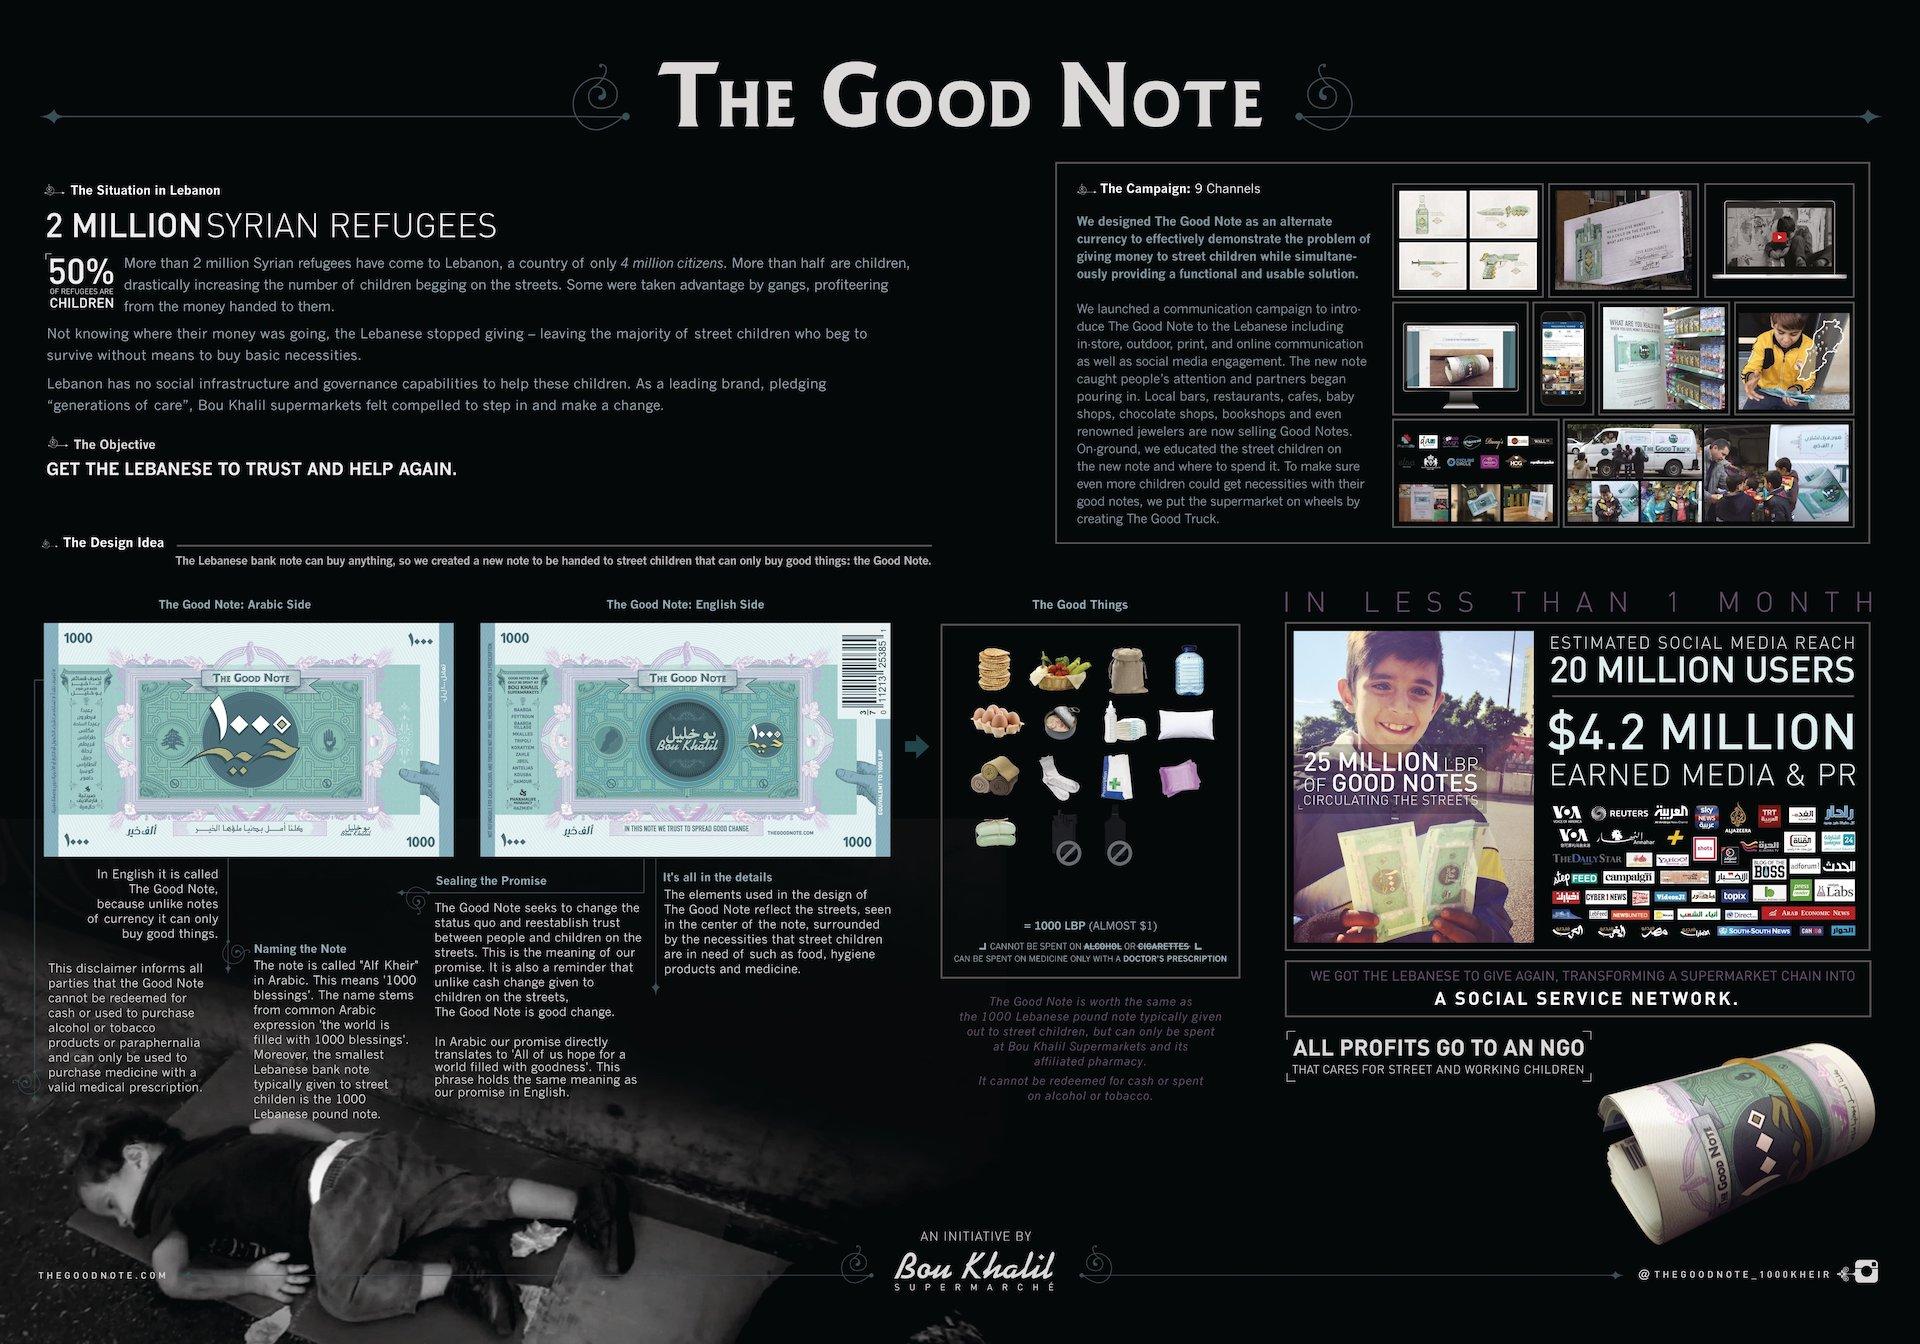 bou-khalil-the-good-note-1.jpg